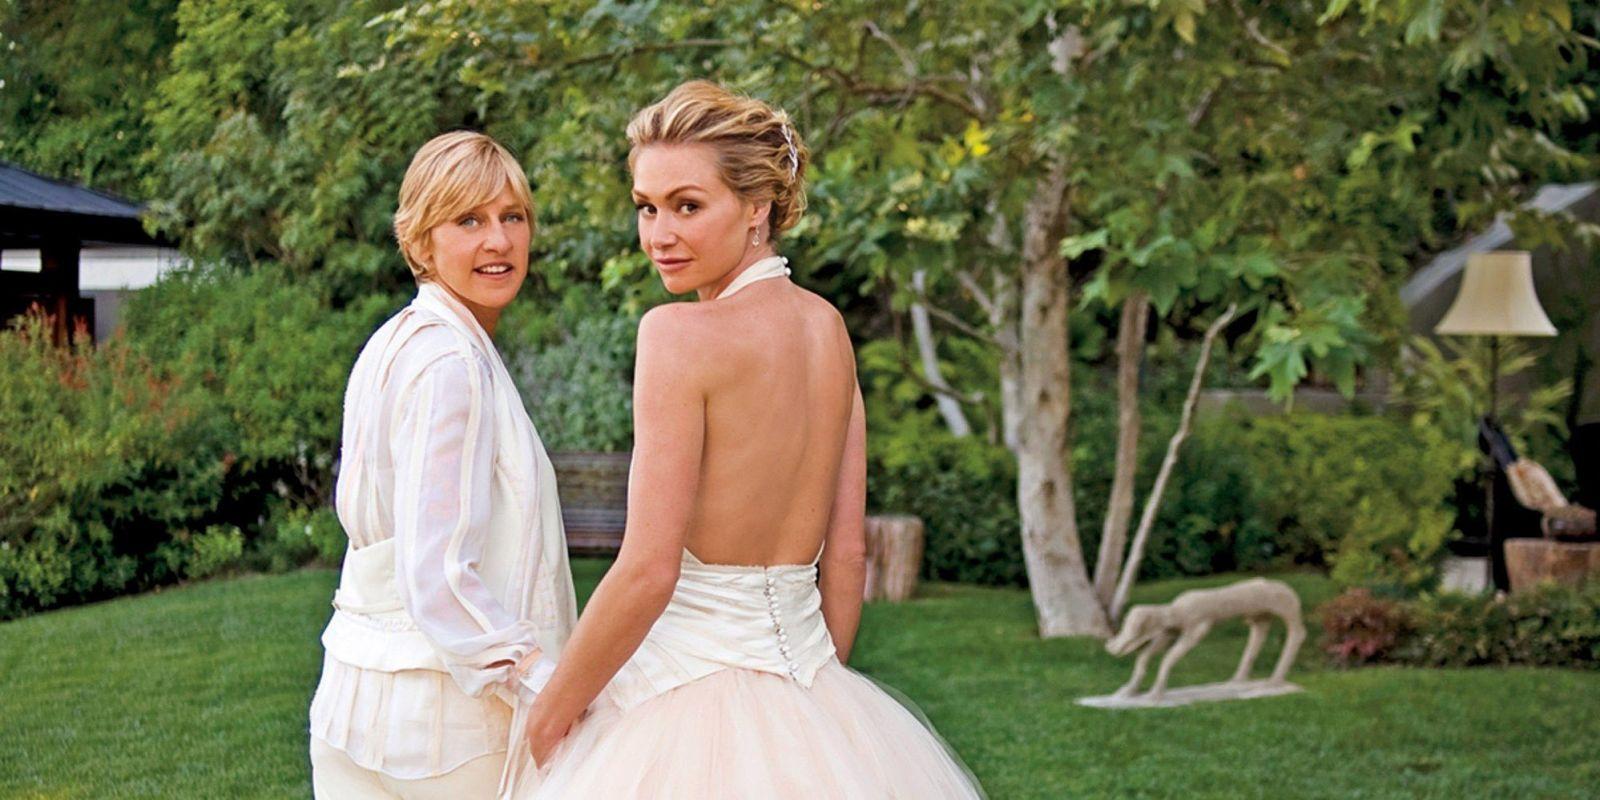 Ellen degeneres and portia de rossi love story are ellen for Ellen degeneres and portia de rossi story